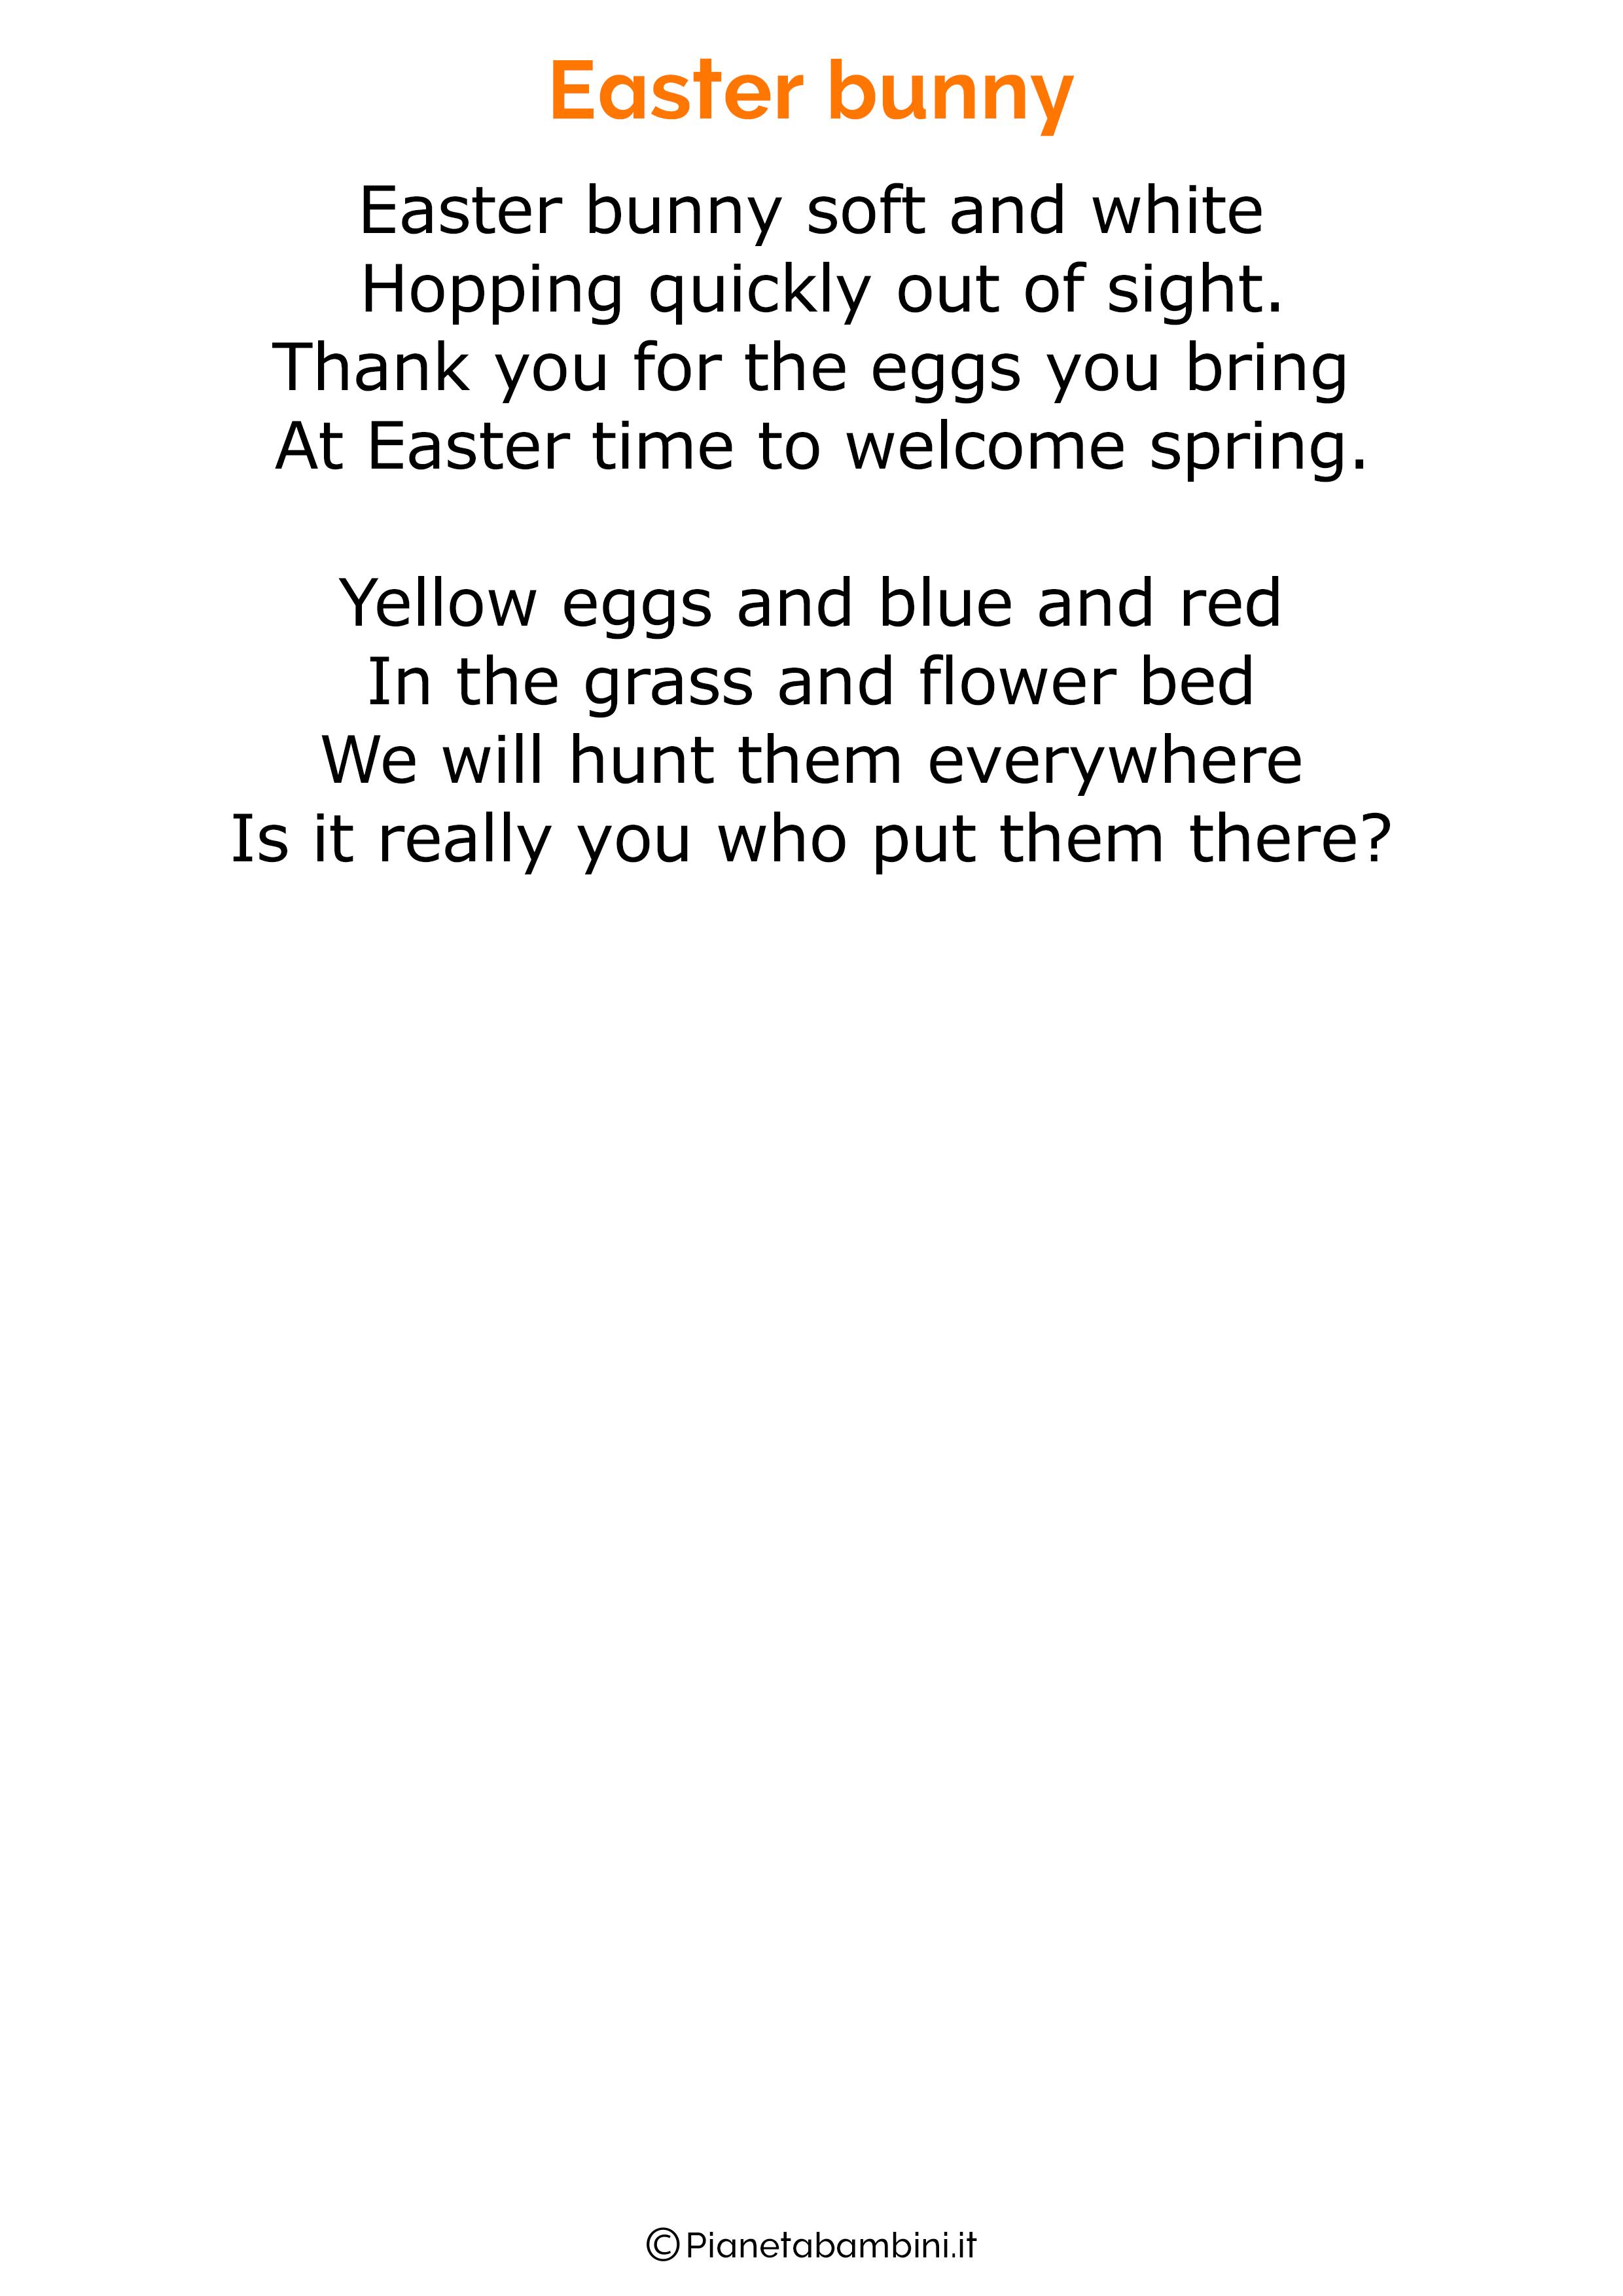 Poesie di Pasqua in inglese per bambini 29